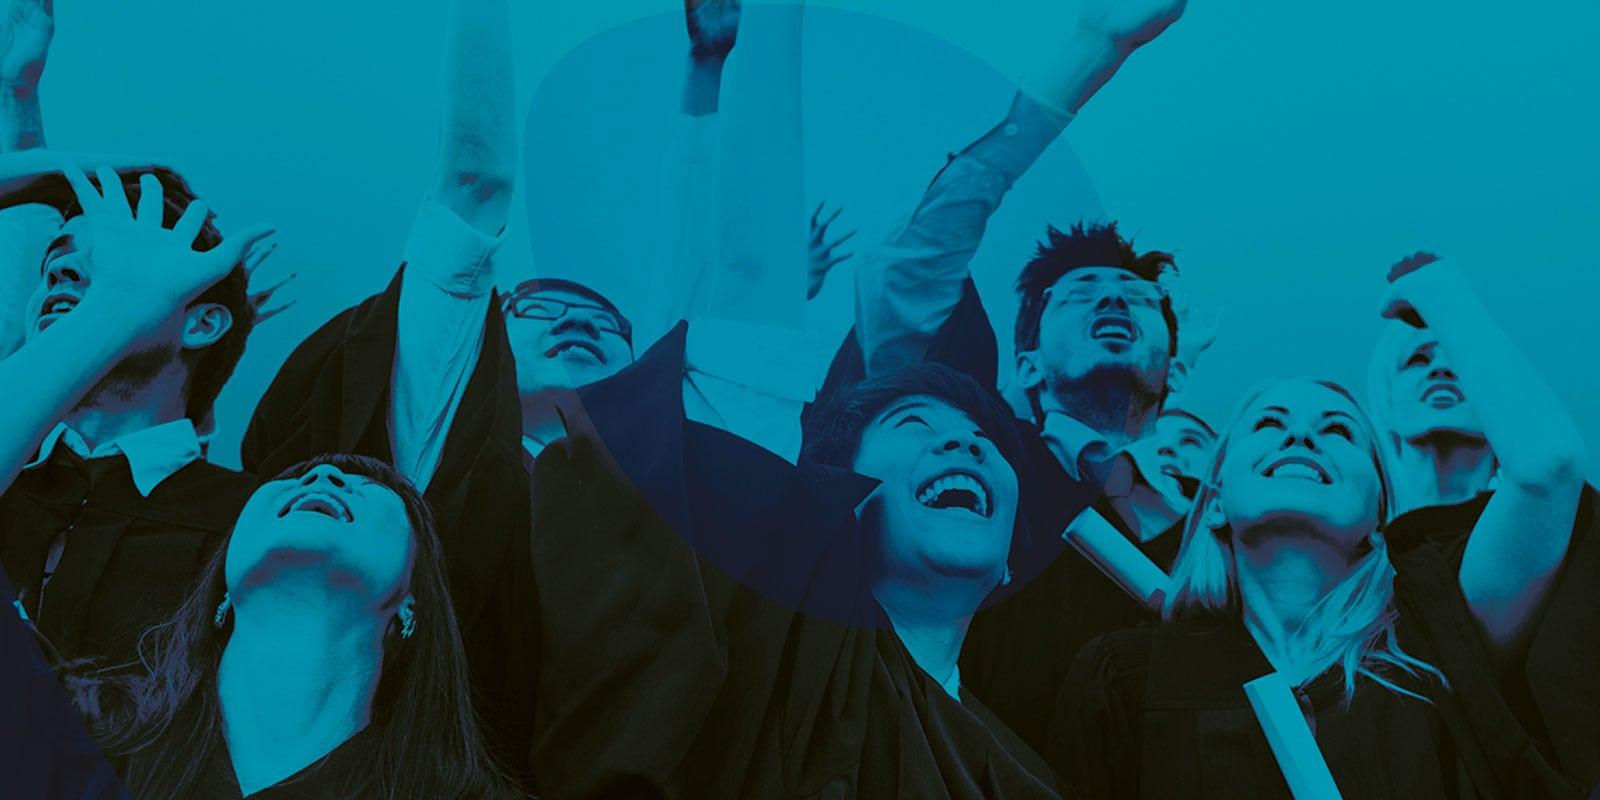 EFMD-GlobalFocusMagazine-Vol10_Issue01-03-The-six-principles